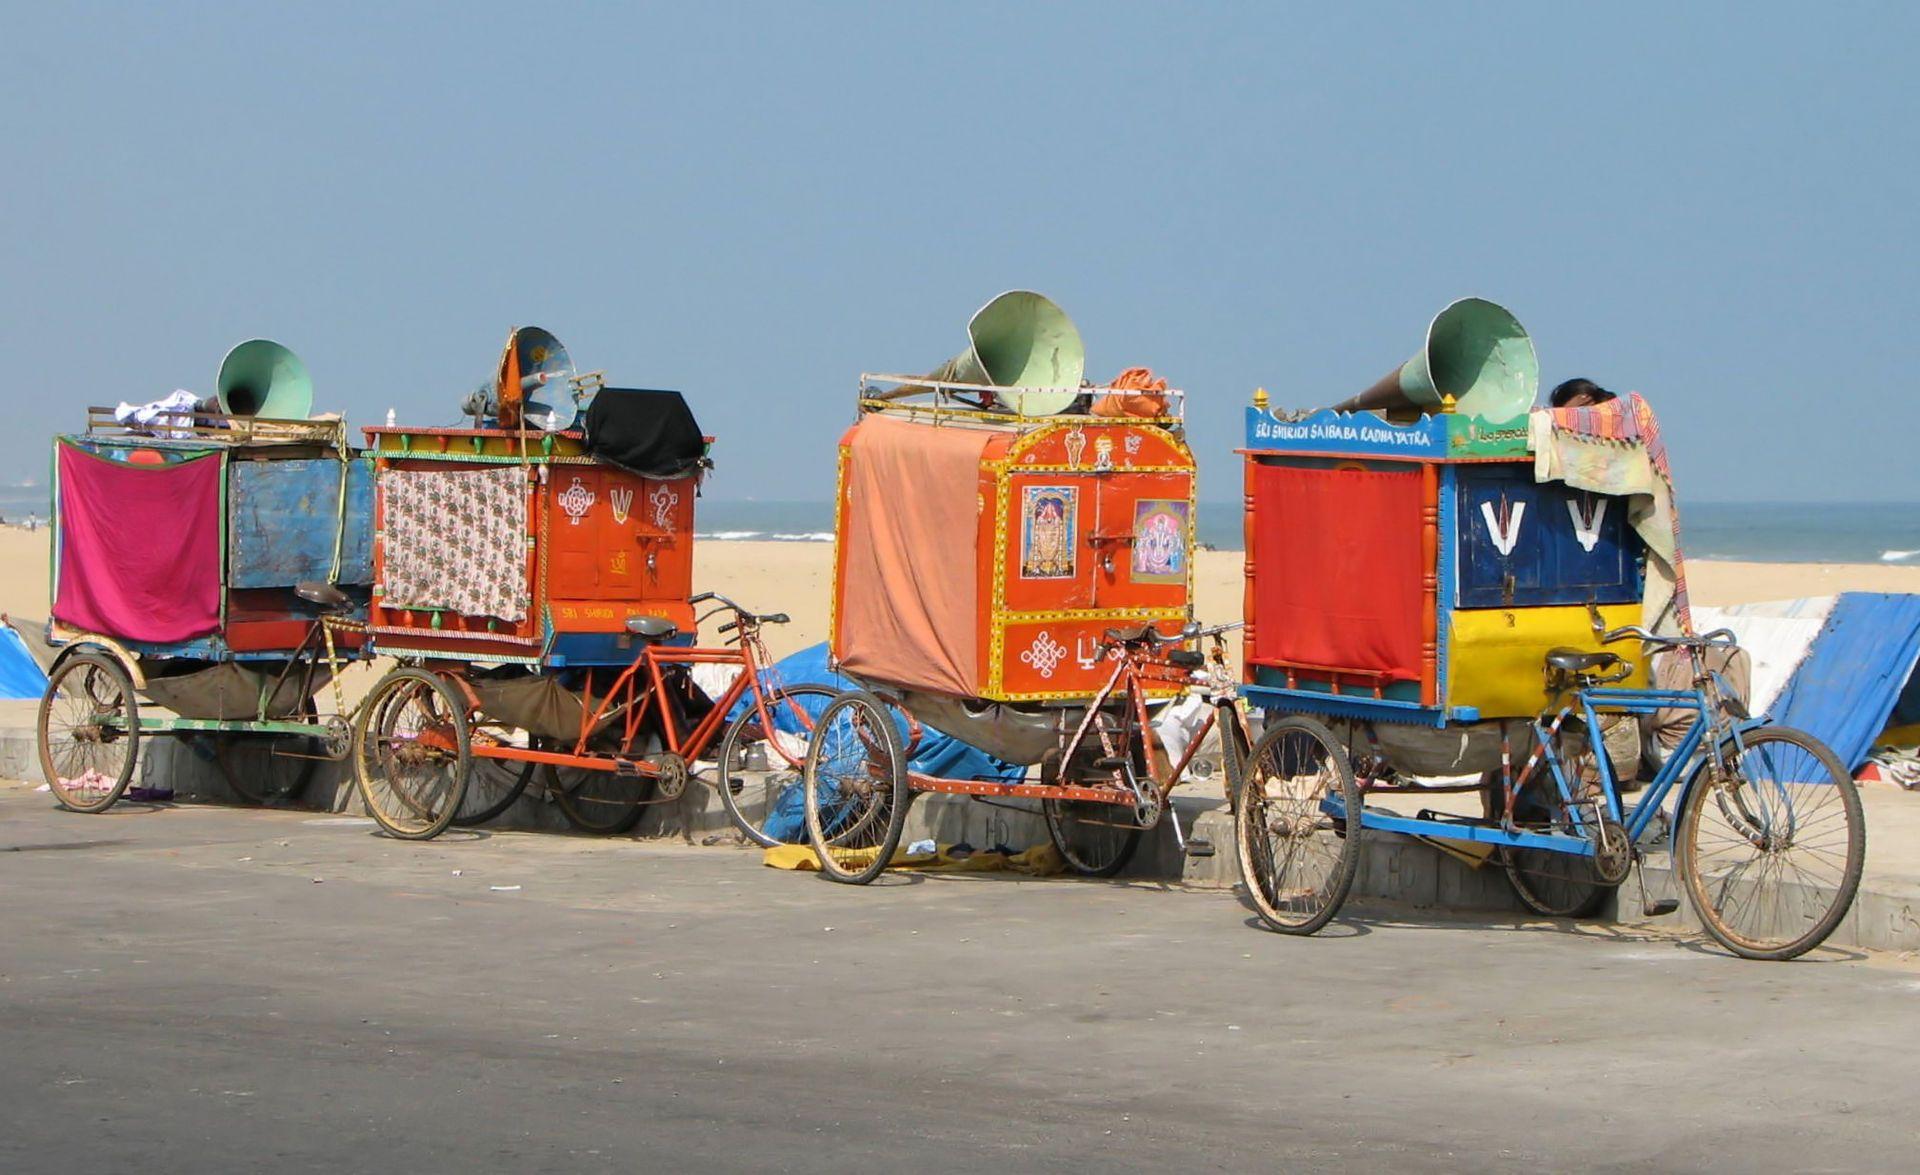 Cycle rickshaws used by a street theatre company, Chennai